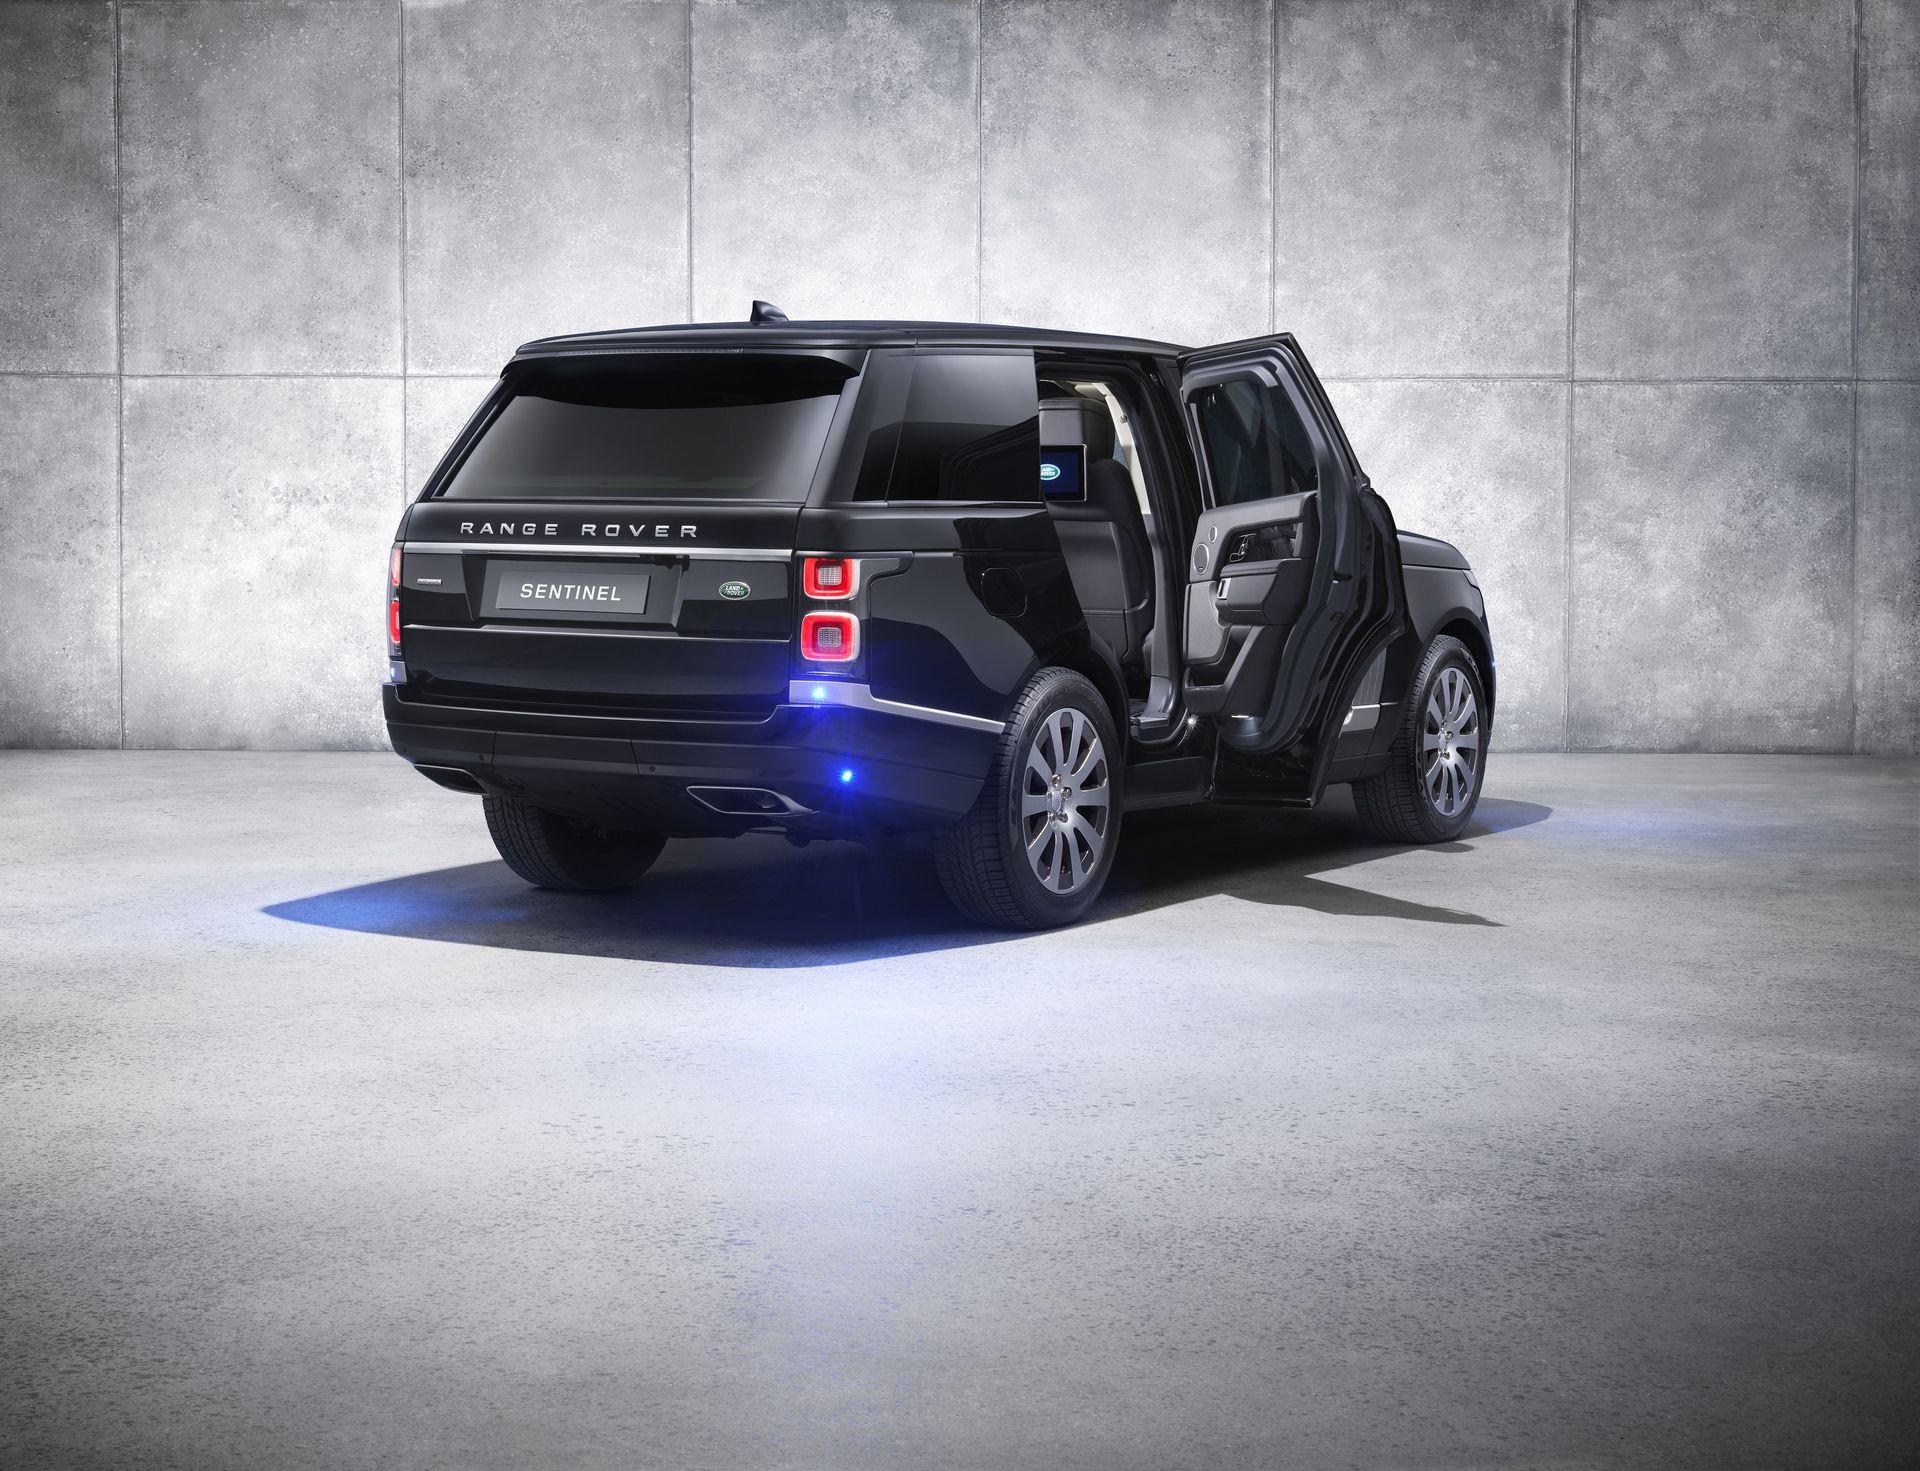 Range Rover Sentinel 2019 12